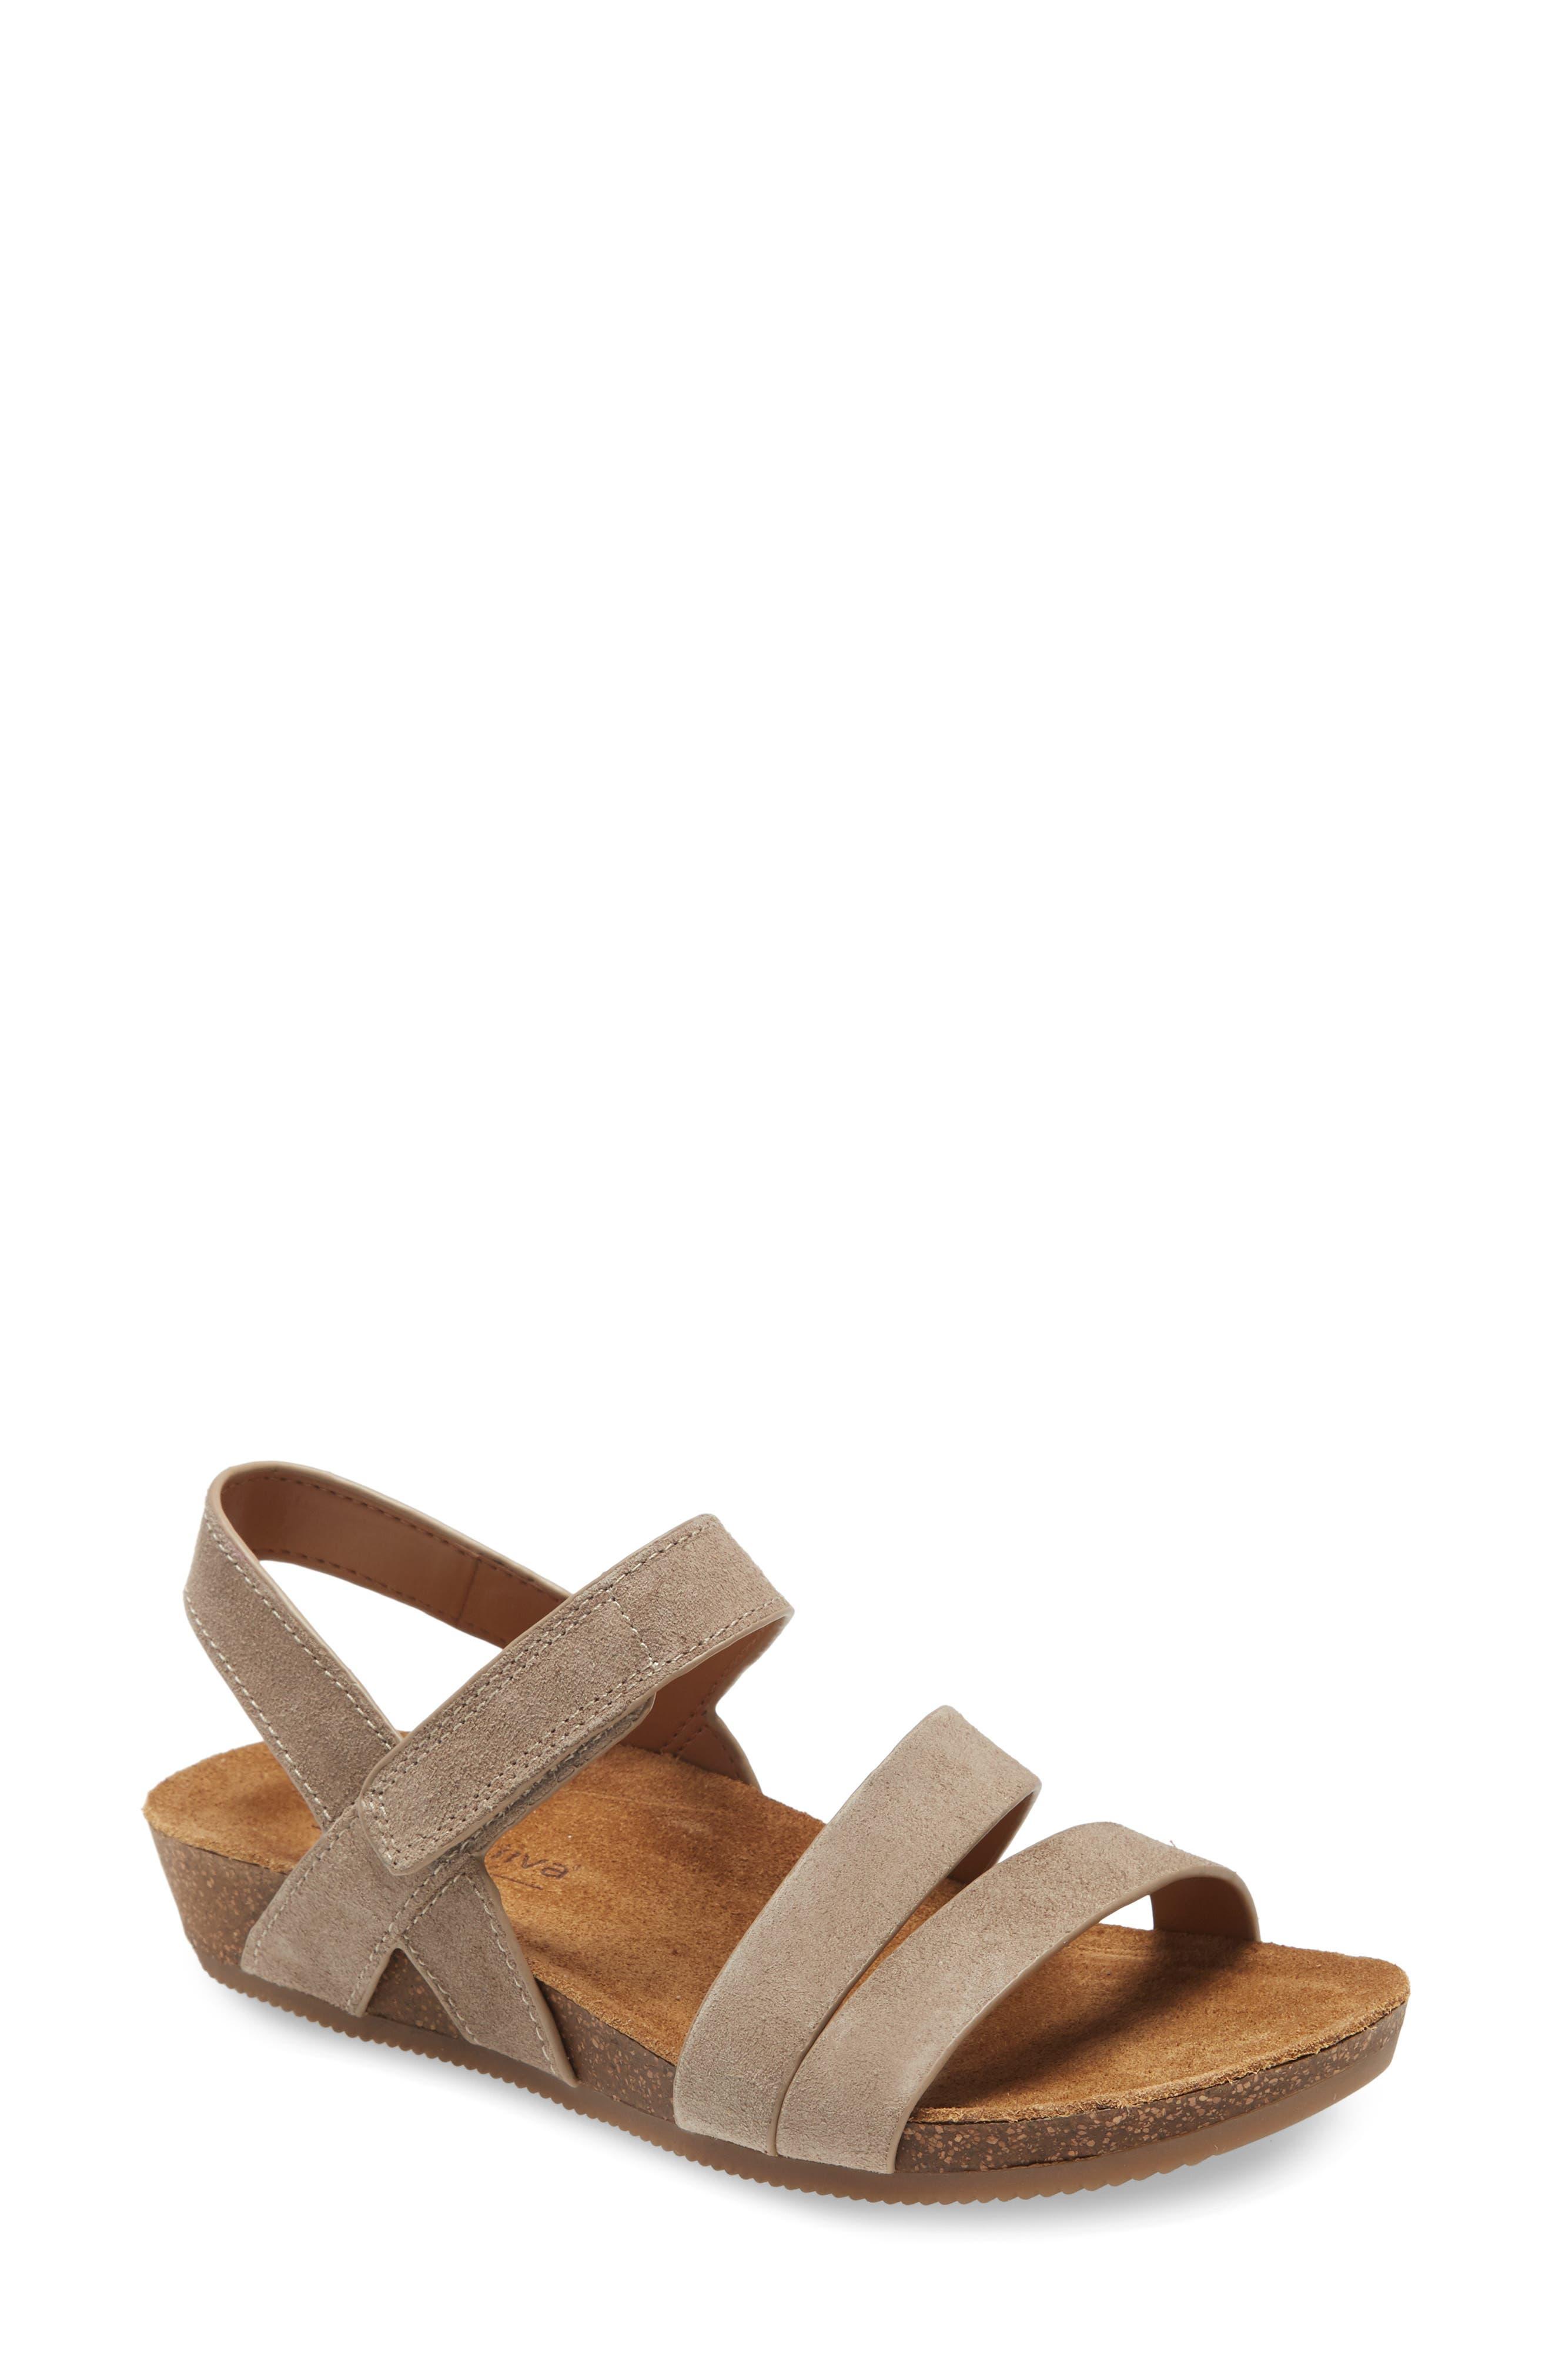 Gardena Strappy Sandal